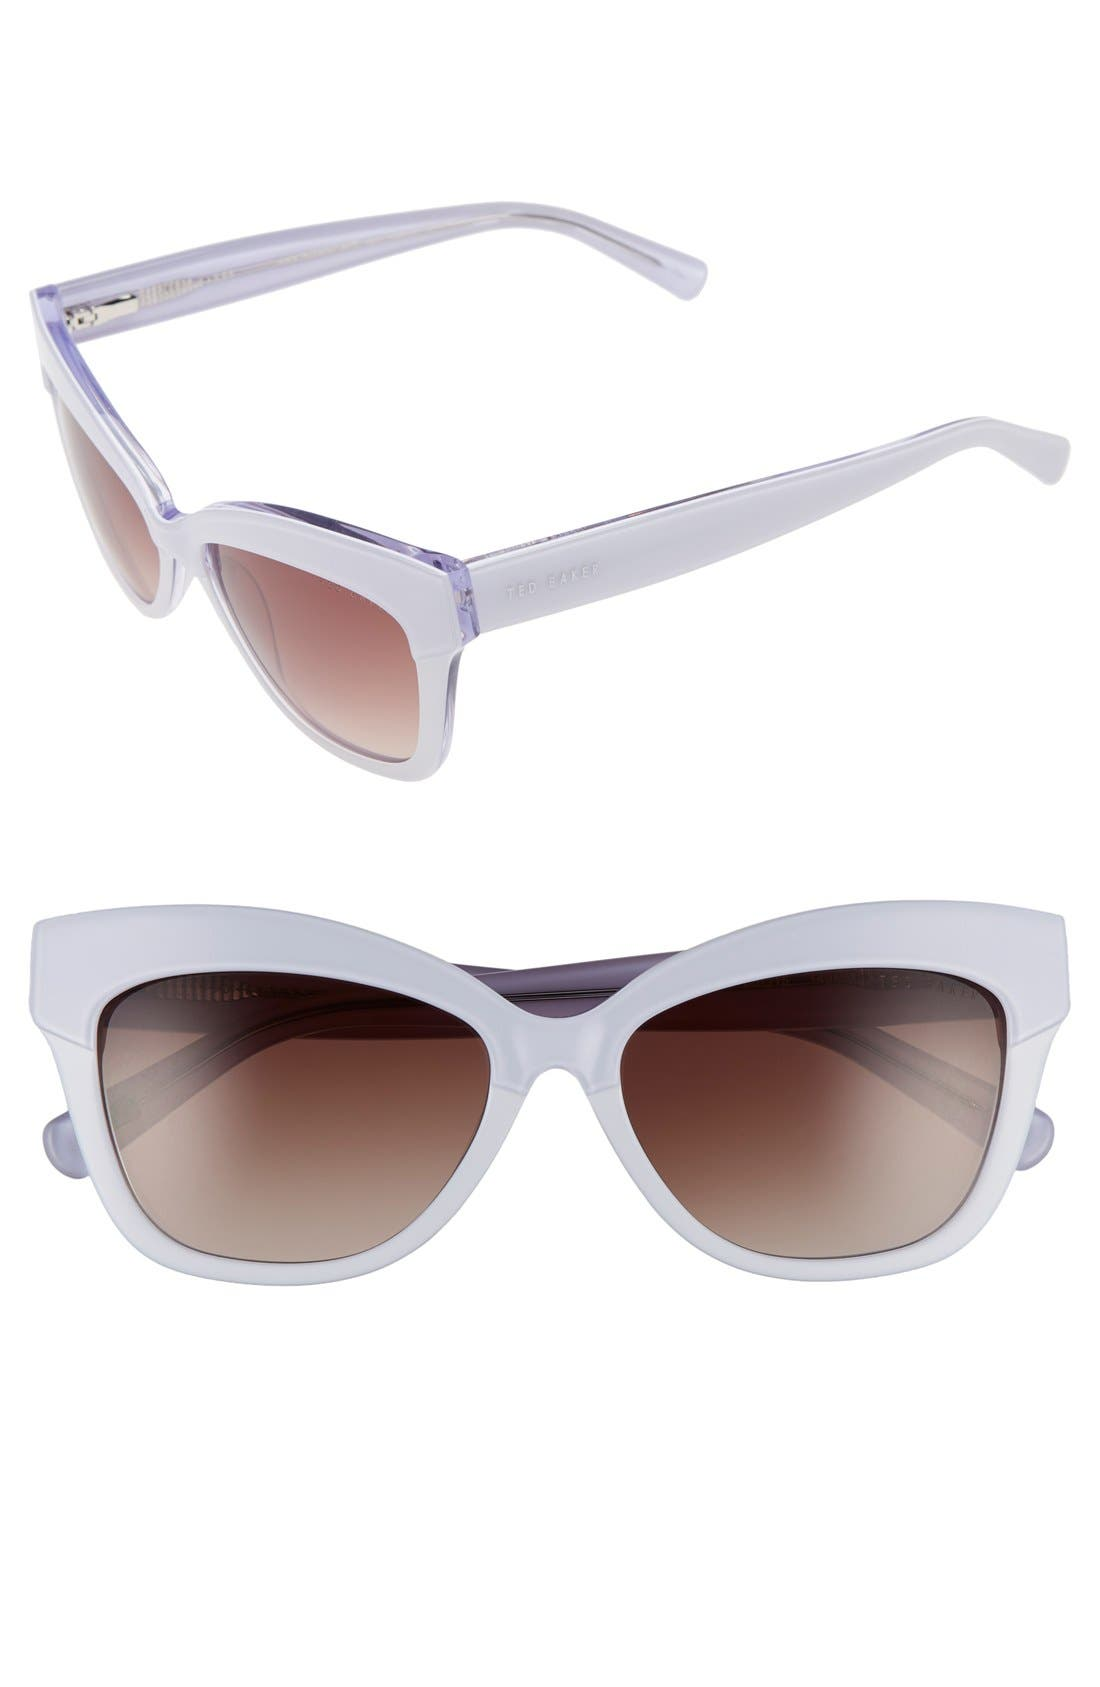 55mm Cat Eye Sunglasses,                             Main thumbnail 1, color,                             100